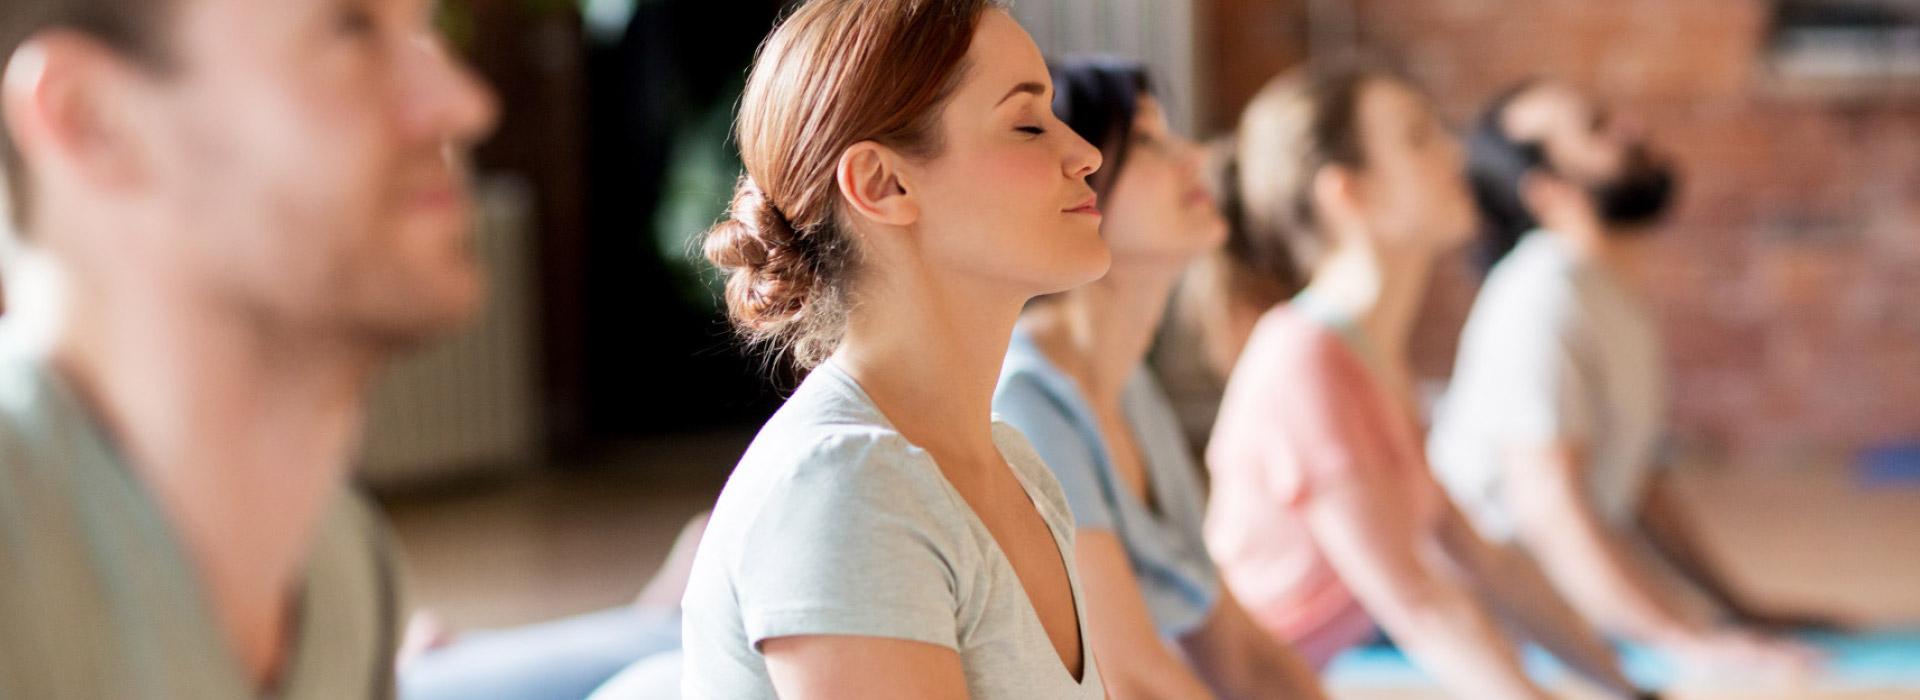 13-yoga-gesundheitswochen-2019